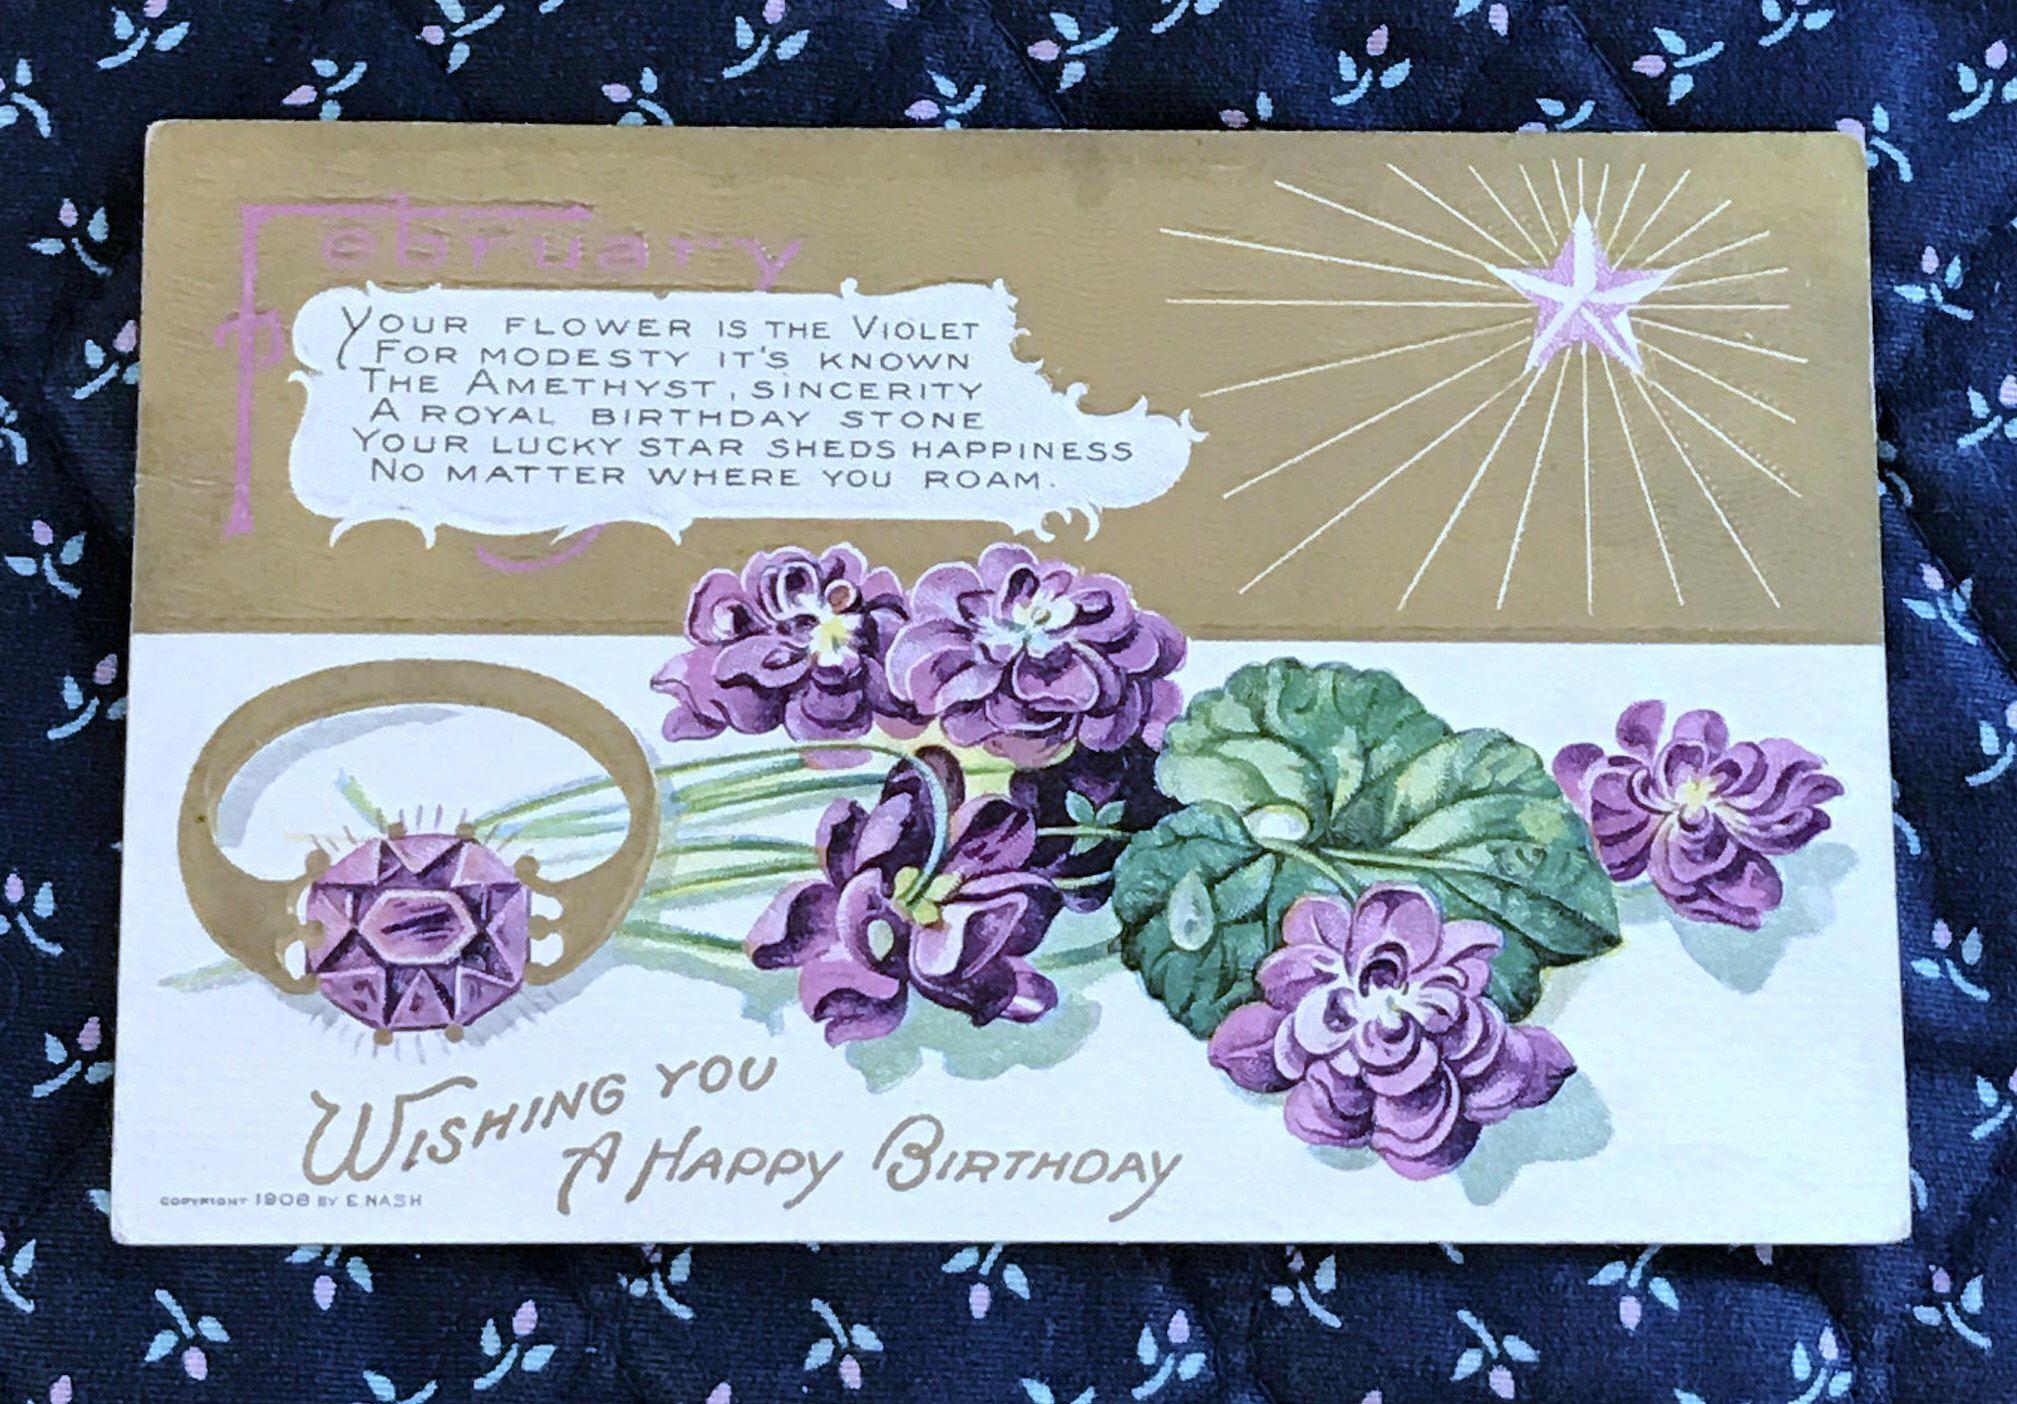 Antique 1908 embossed february happy birthday postcard violet antique 1908 embossed february happy birthday postcard violet flowers amethyst ring birthday verse wishing you a happy birthday izmirmasajfo